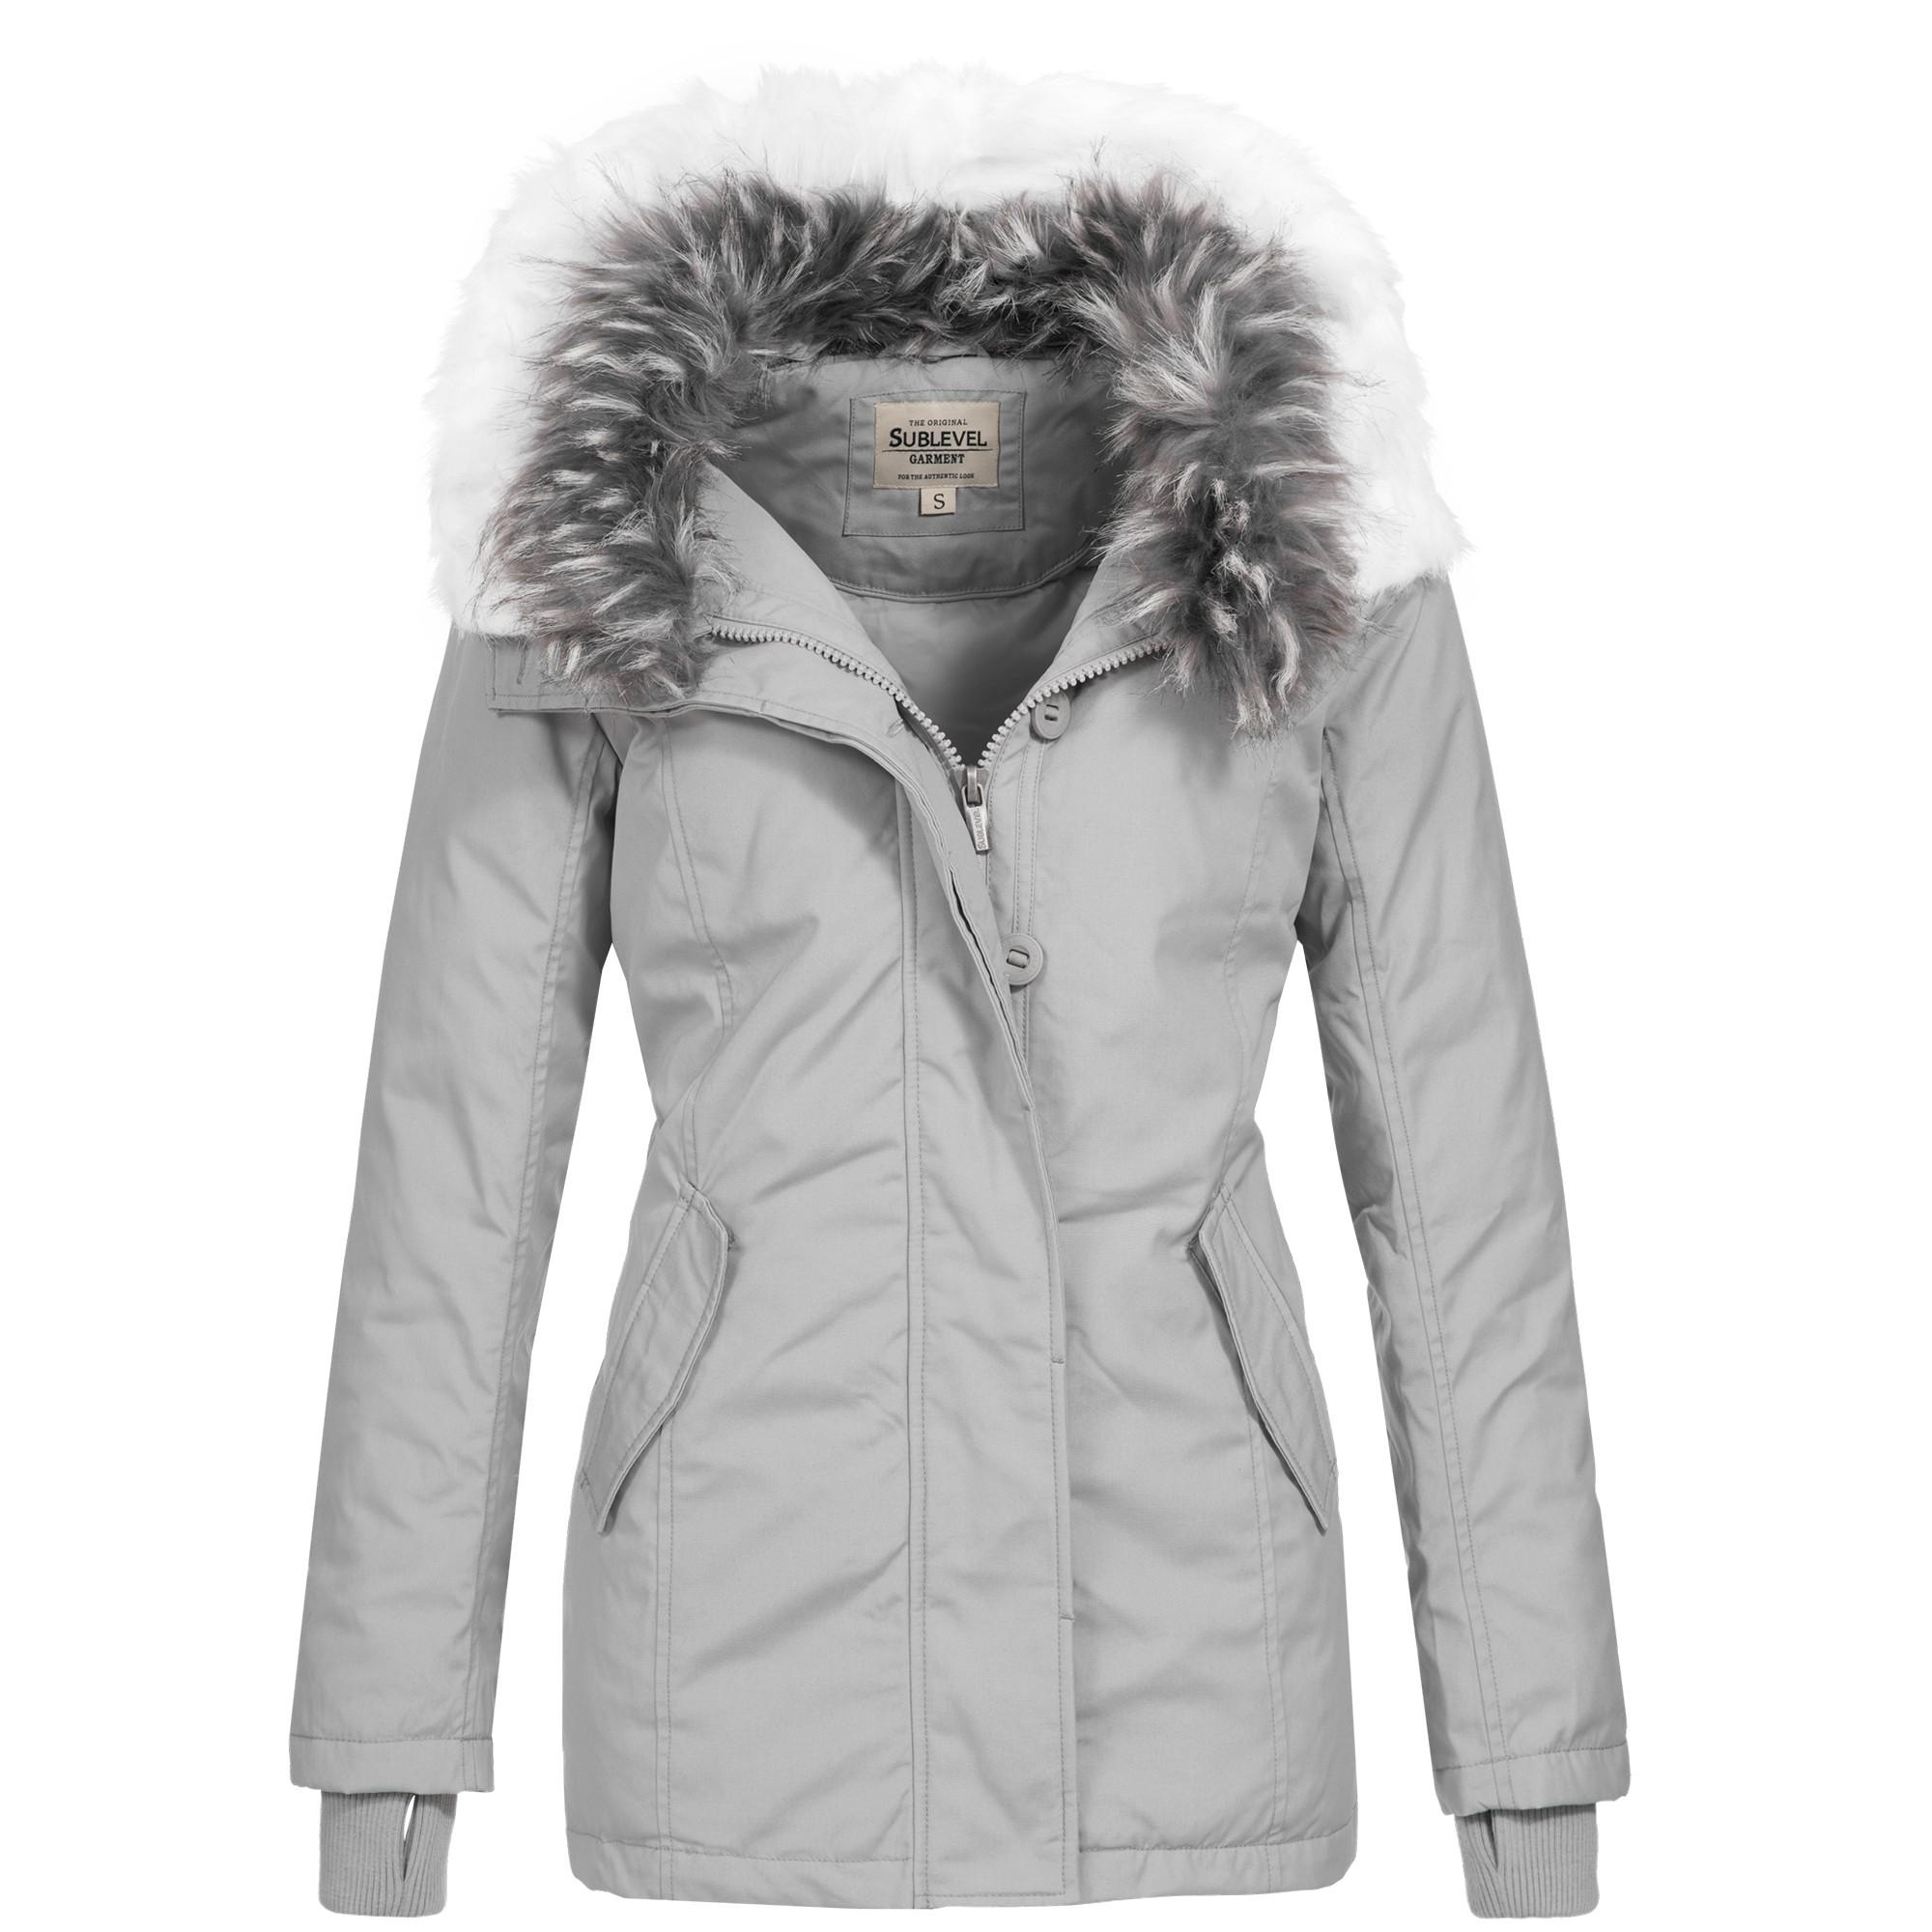 best service fd4a2 ef052 Sublevel Damen Winter Mantel Wintermantel Jacke Luxus Kunstpelz warm 44406  S-XL 3-Farben